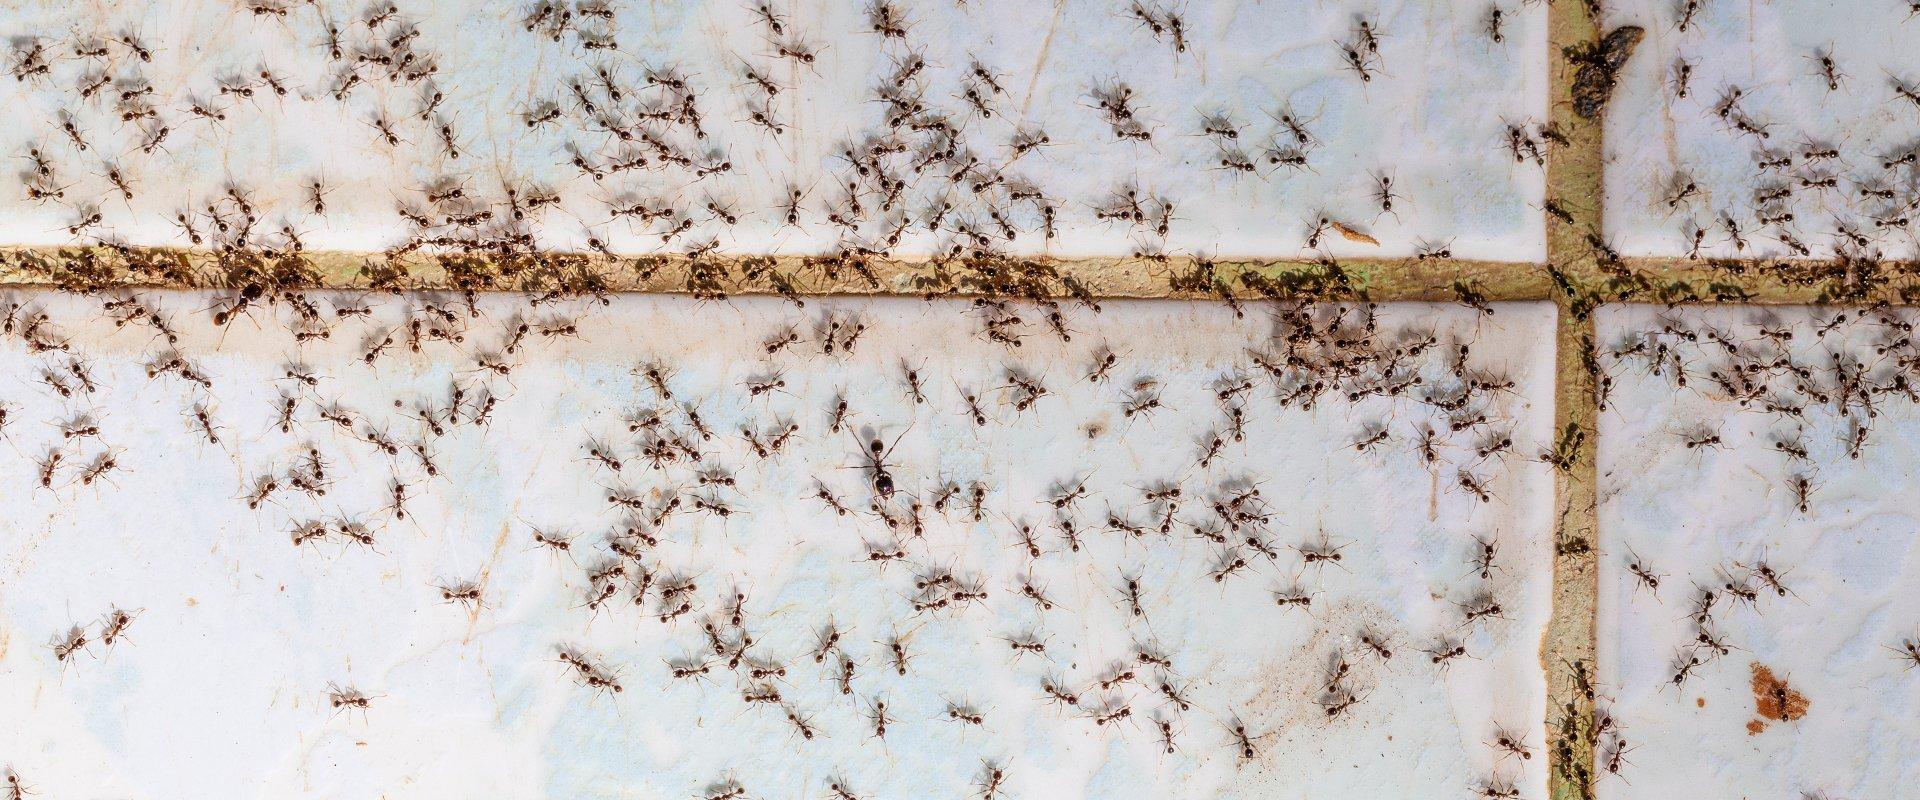 ants on a tiled kitchen floor